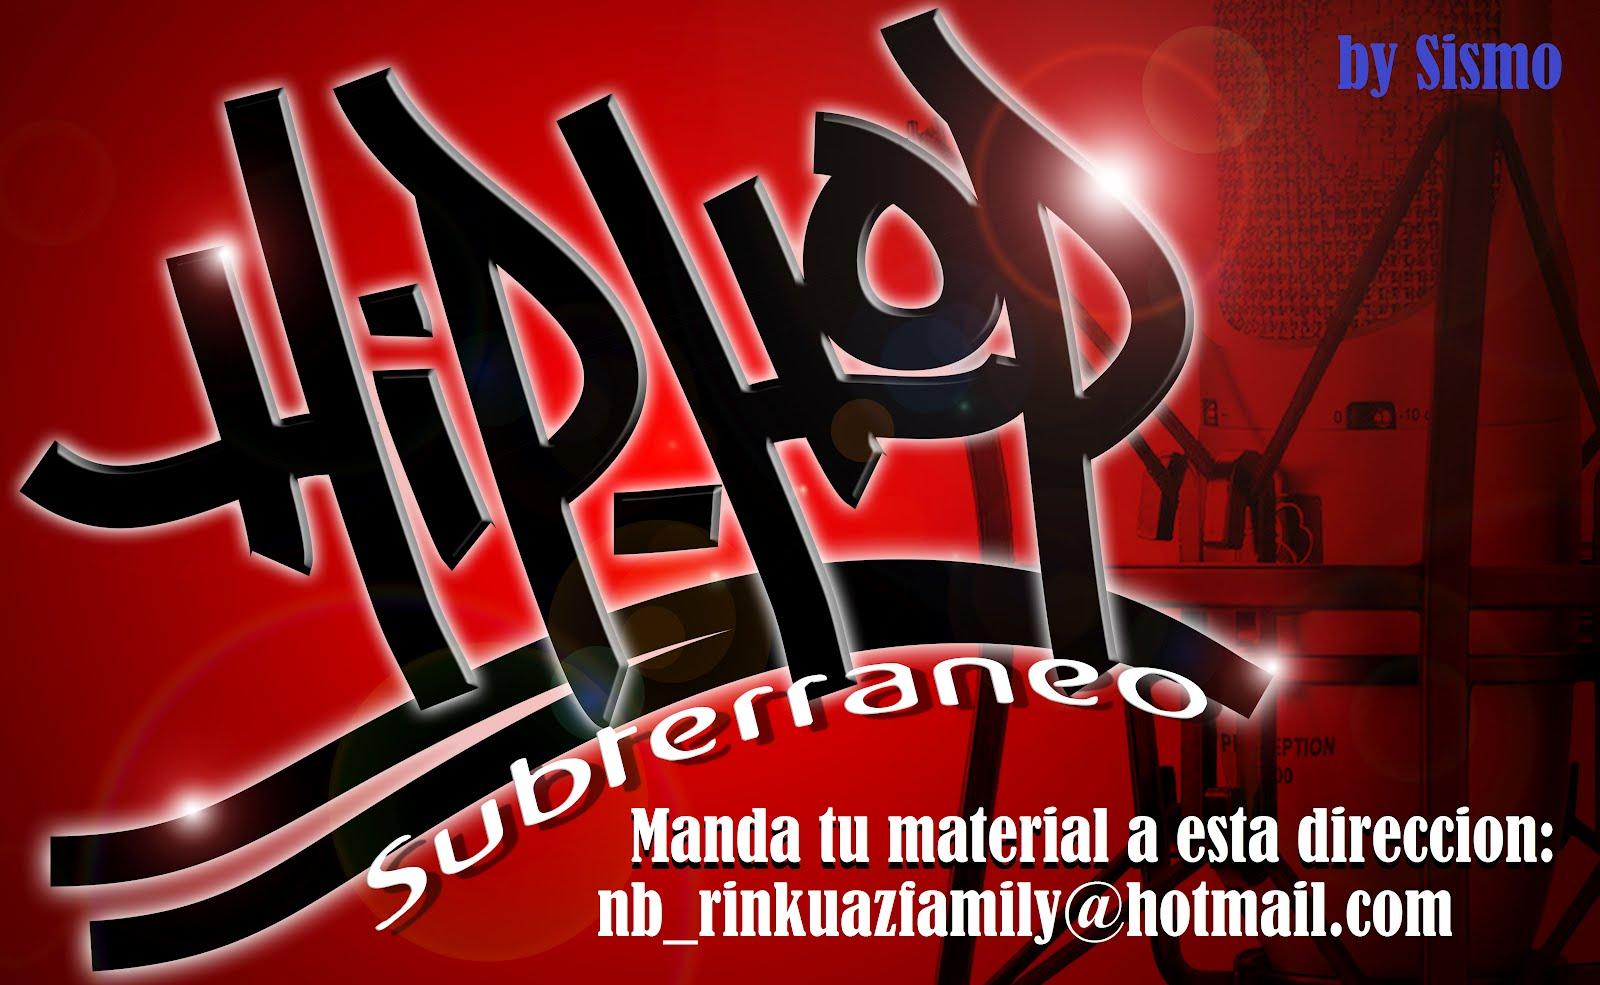 HIP-HOP SUBTERRANEO